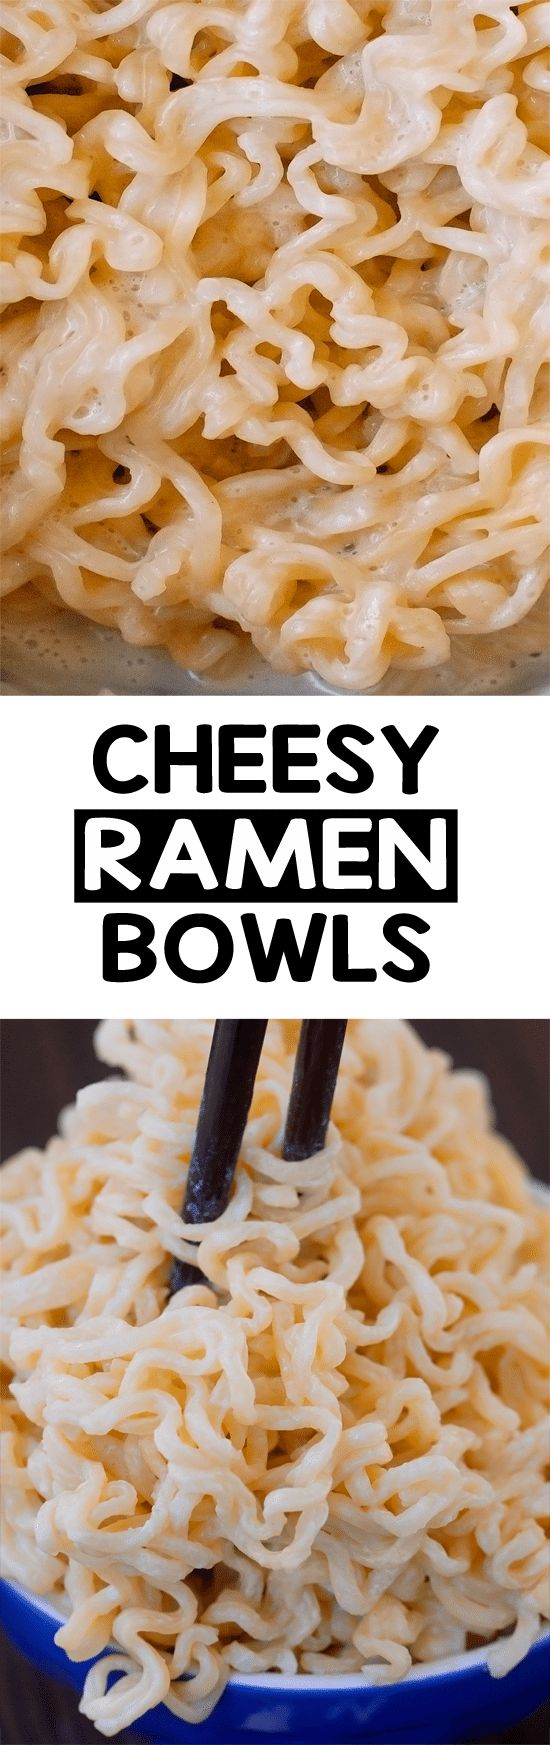 Cheesy Ramen Bowl Easy, healthy, savory comfort food in a bowl.